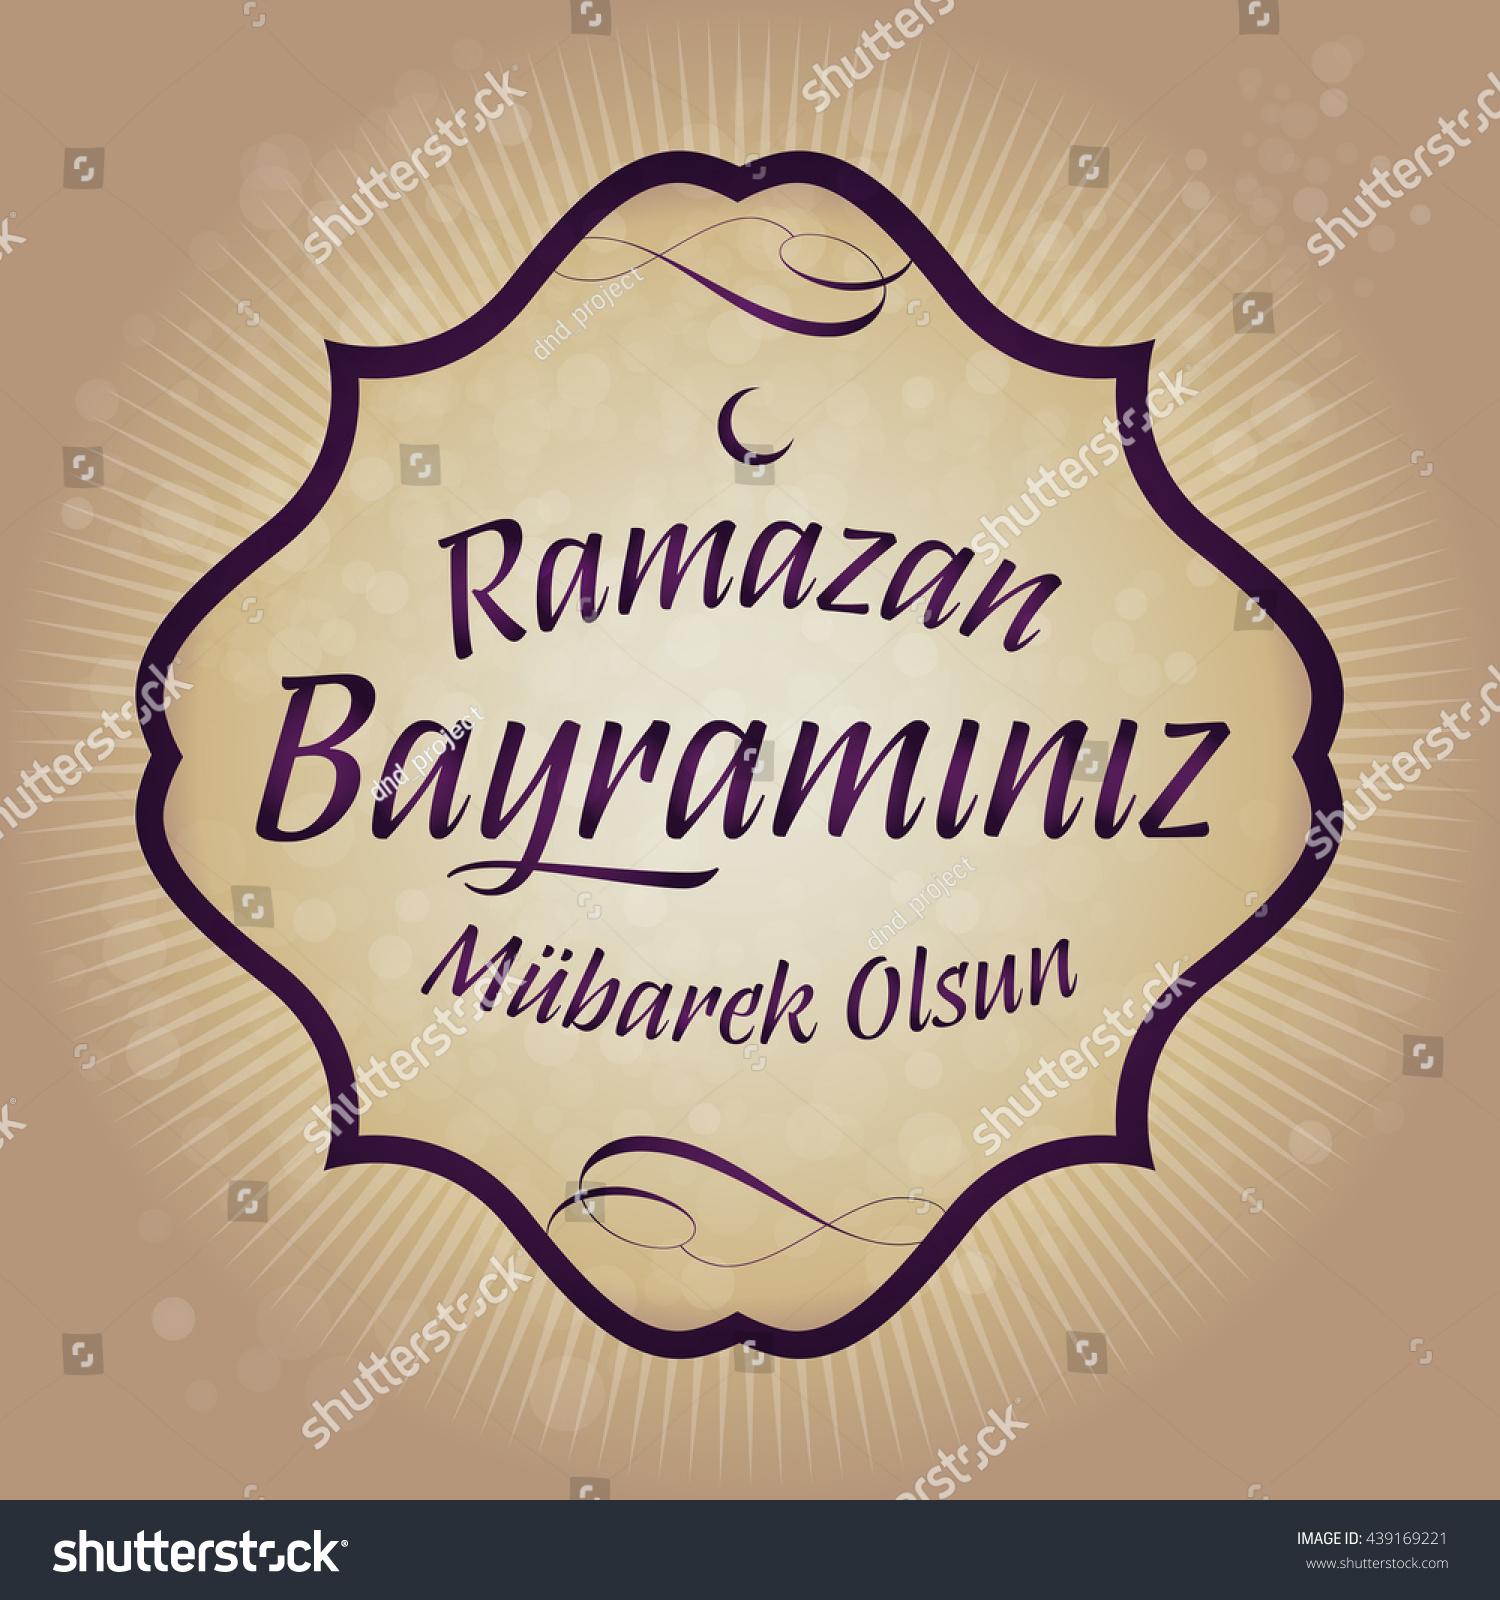 Eid alfitr mubarak islamic feast greetings stock vector 439169221 eid al fitr mubarak islamic feast greetings turkish ramazan bayraminiz mubarek olsun kristyandbryce Choice Image